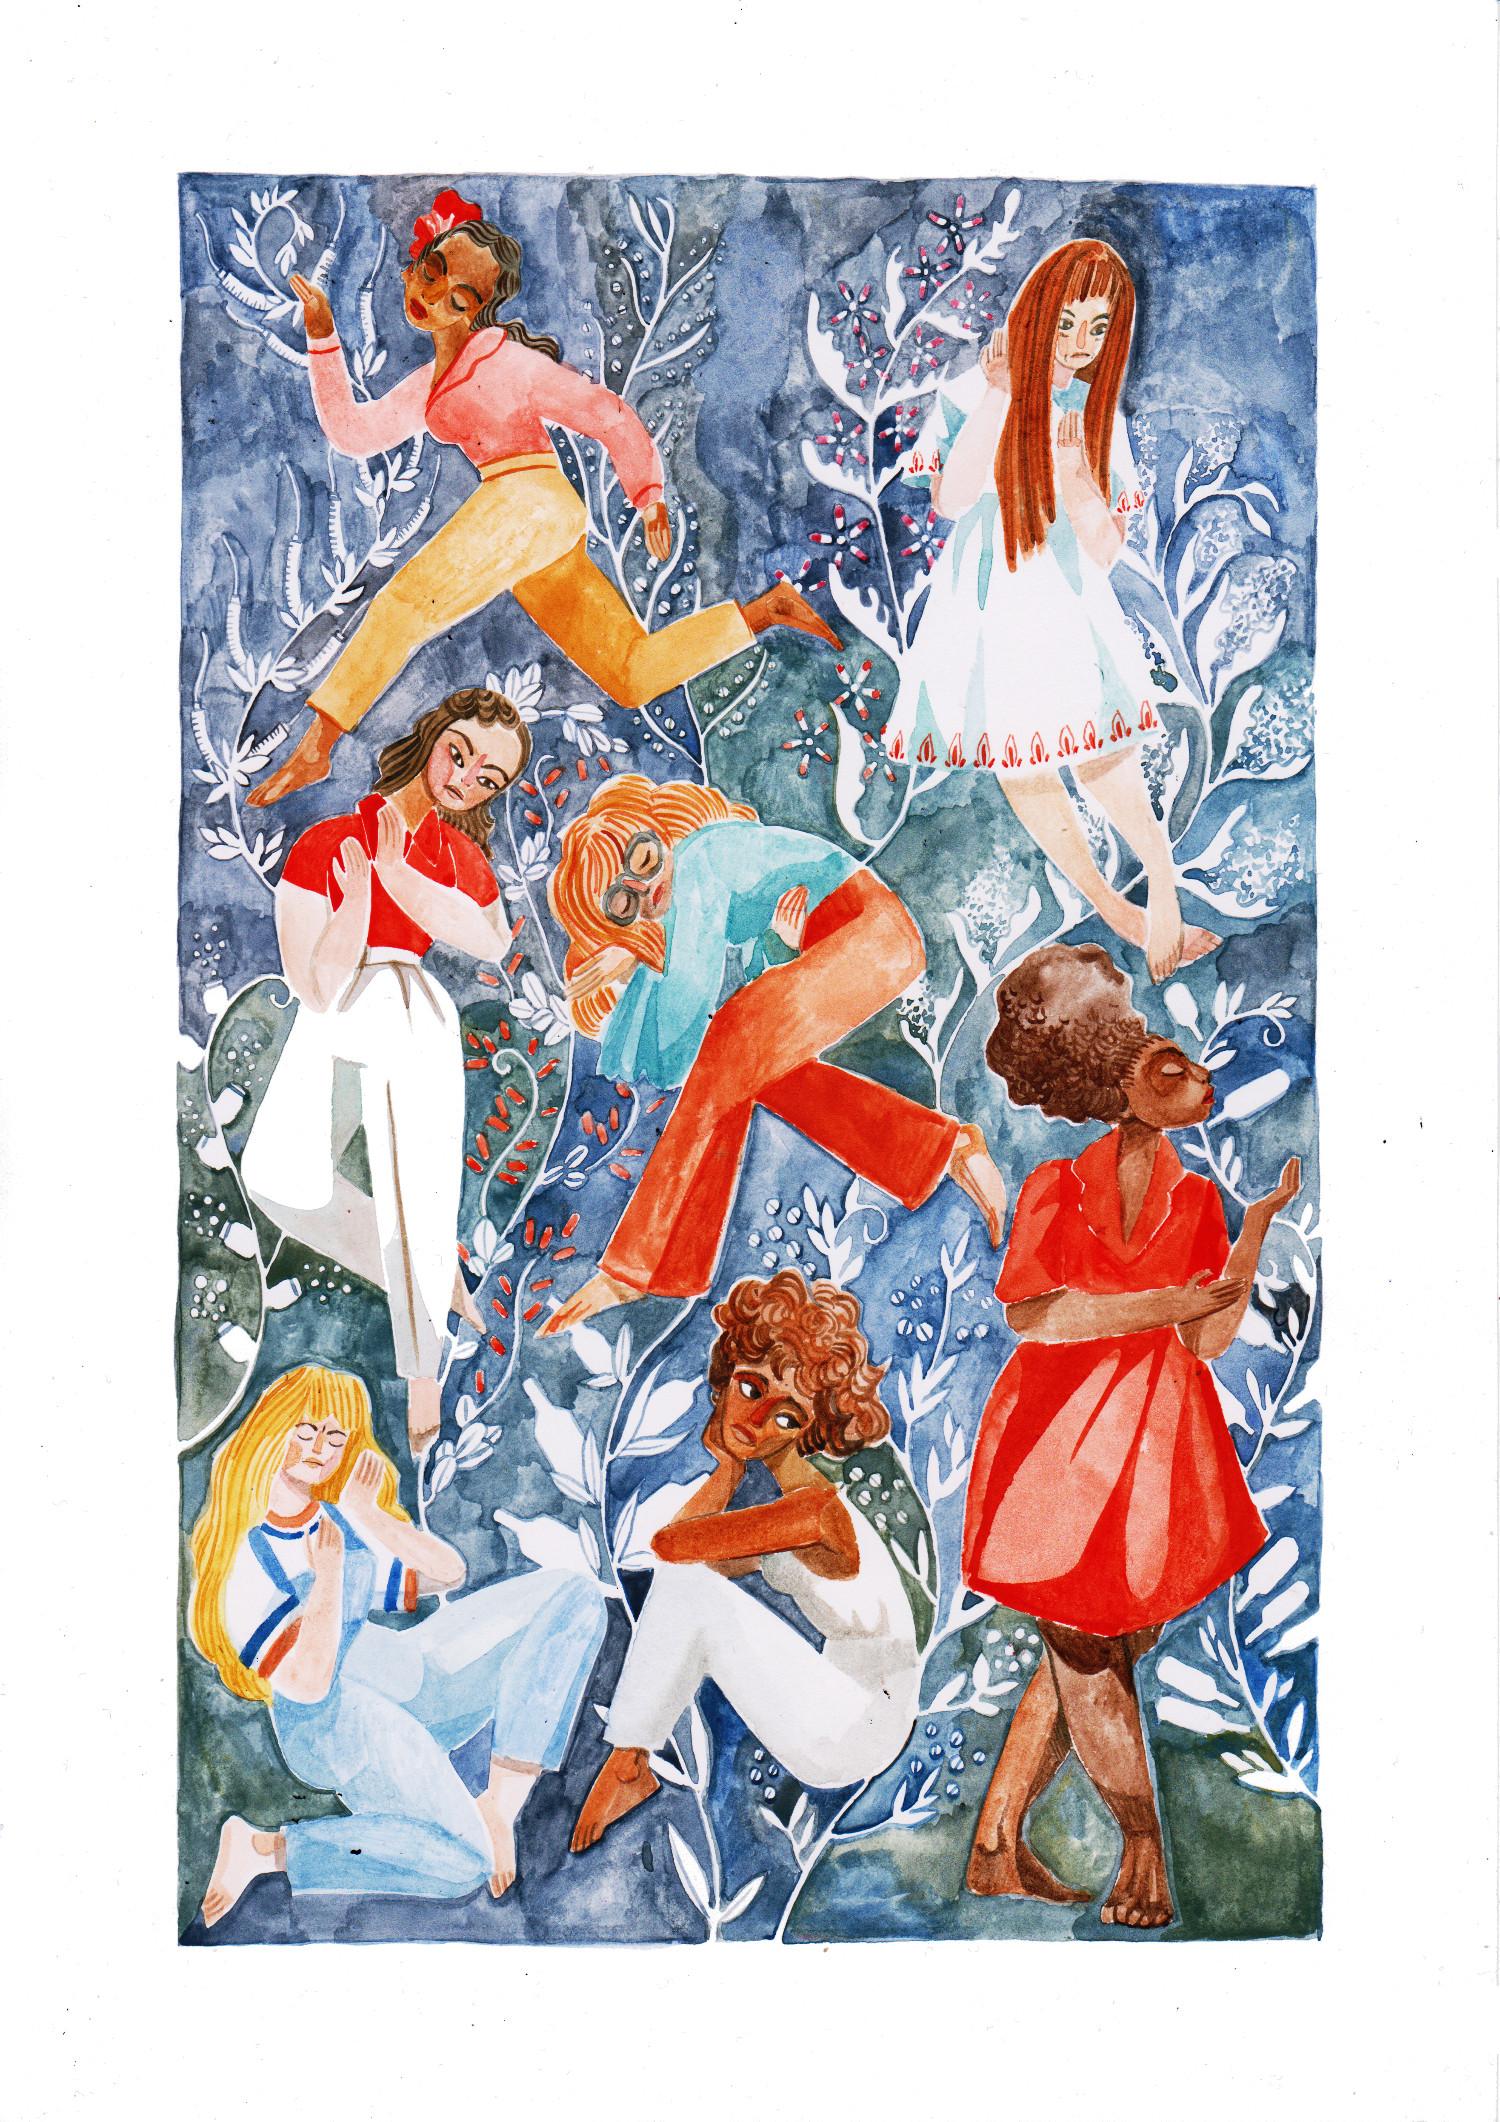 TOP TO BOTTOM, LEFT TO RIGHT: Billie Holiday, Karen Dalton, Misora Hibari, Janis Joplin, Sandy Denny, Whitney Houston and Esther Phillips